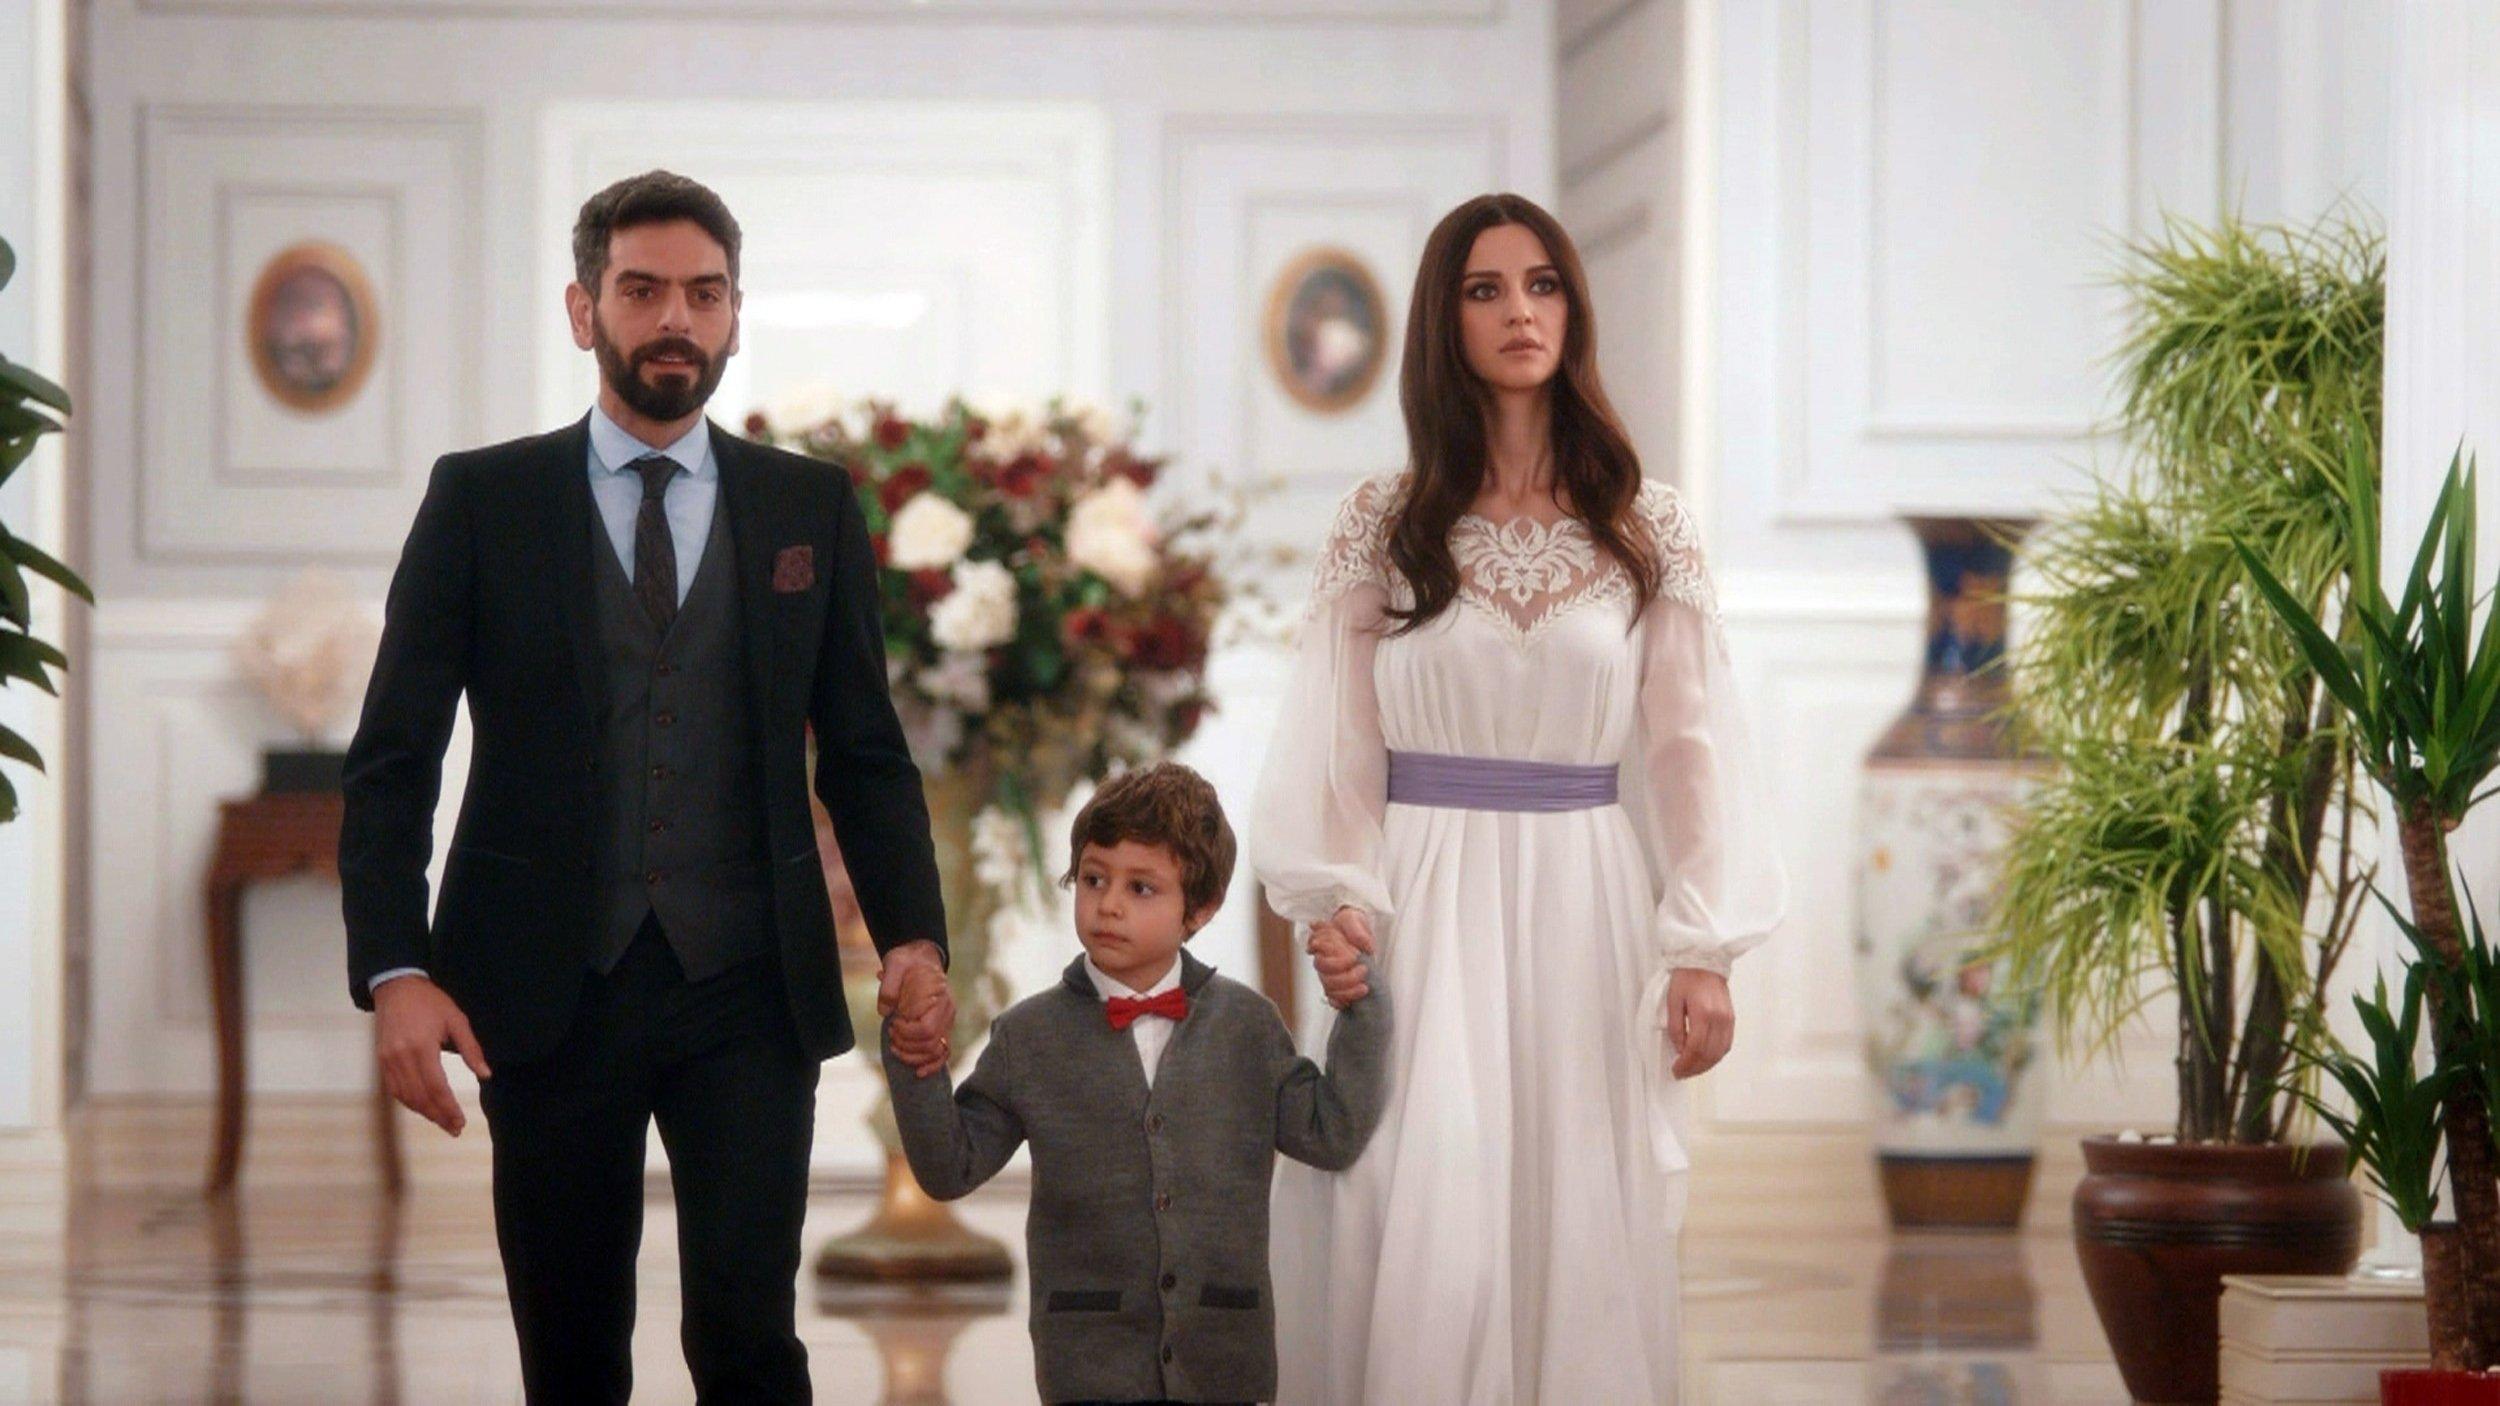 A still shot from 'Sen Anlat Karadeniz' shows actor Mehmet Ali Nuroğlu as Vedat (L), Demir Birinci as Yiğit (C) and actress İrem Helvacıoğlu as Nefes.